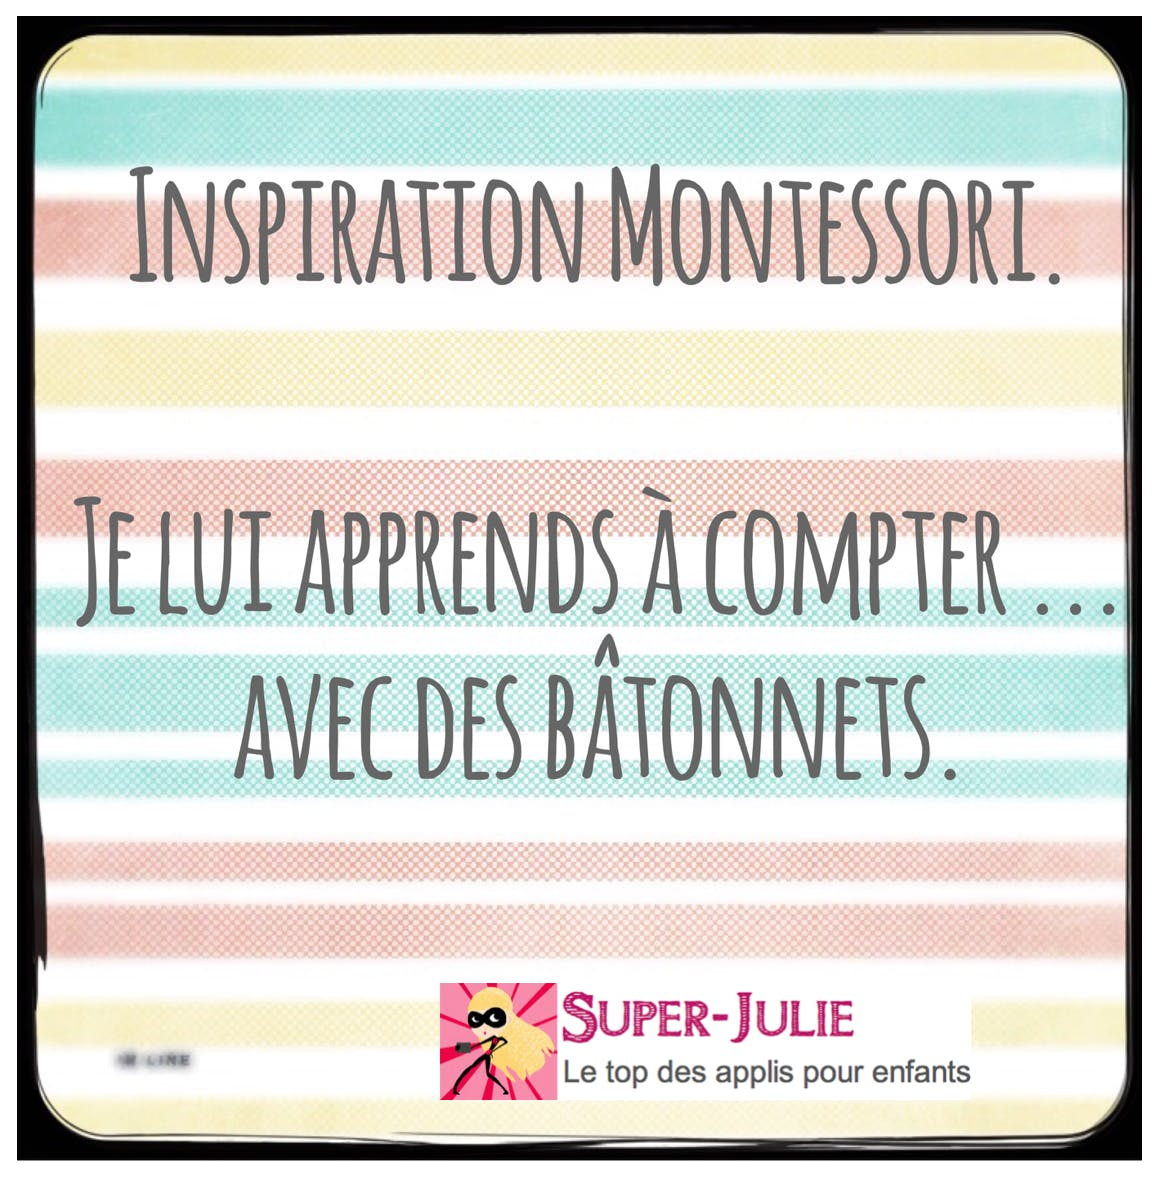 « Inspiration Montessori » : je lui apprends à compter !